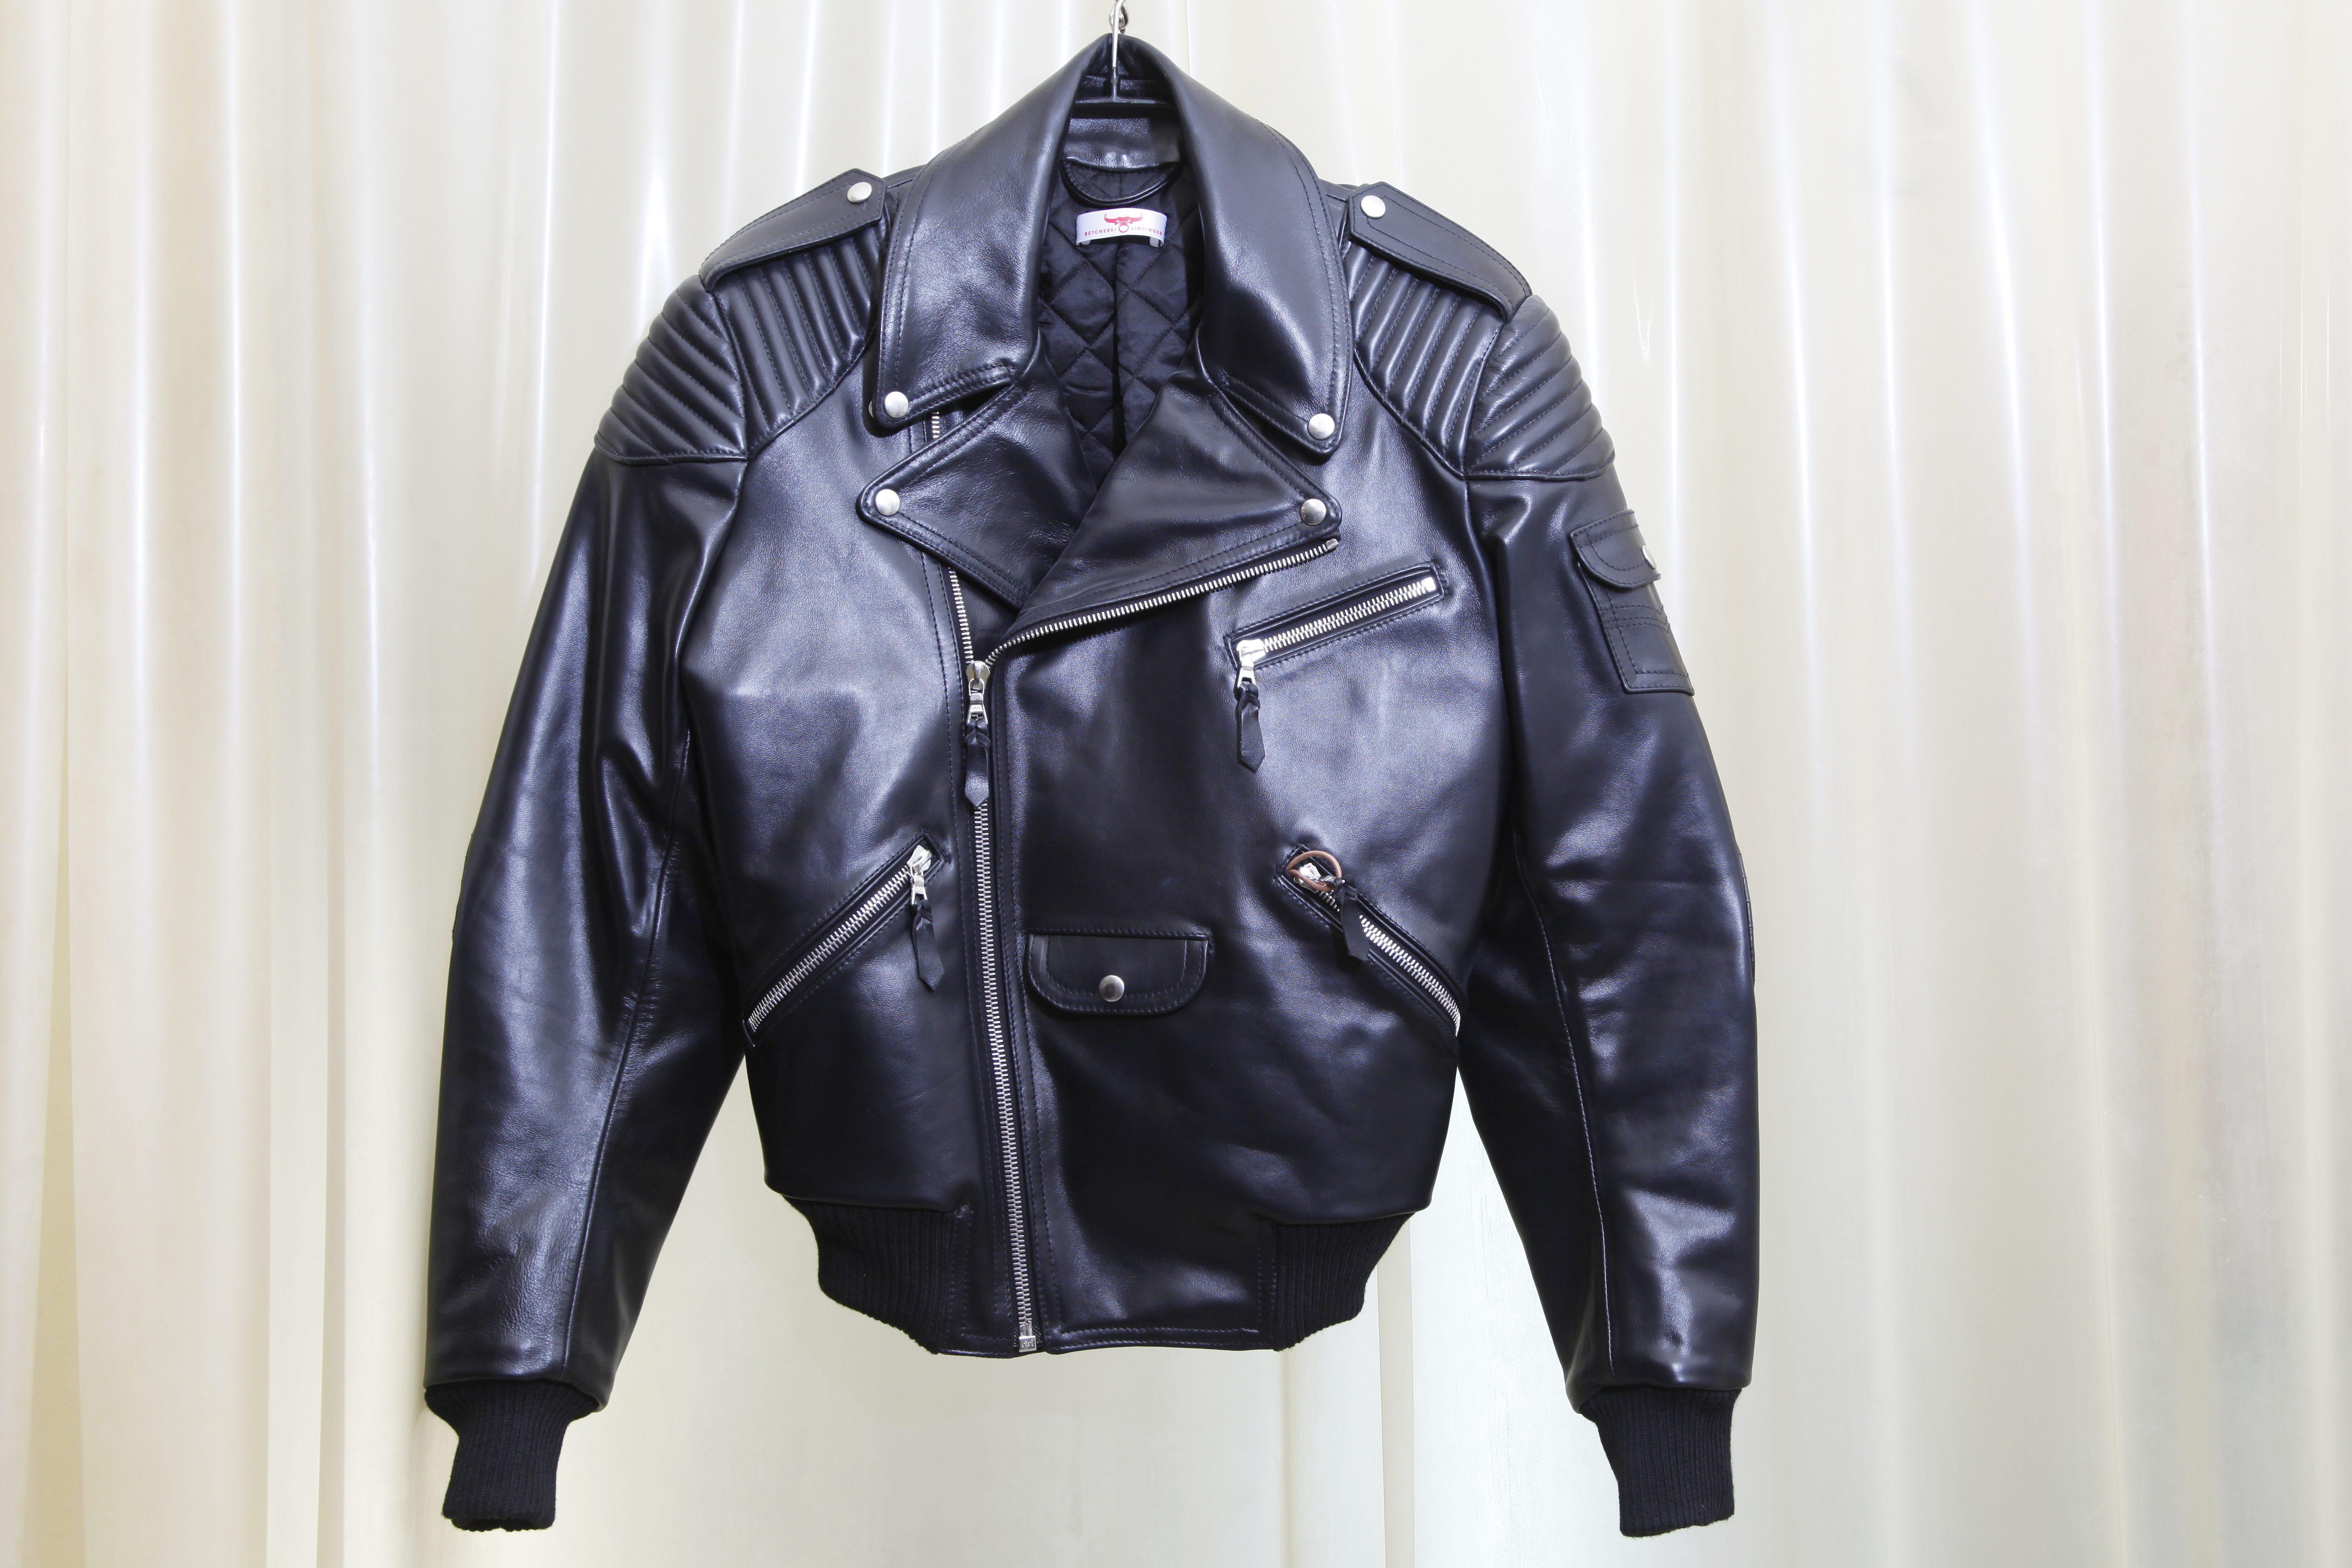 Leather jacket at Butcherei Lindinger